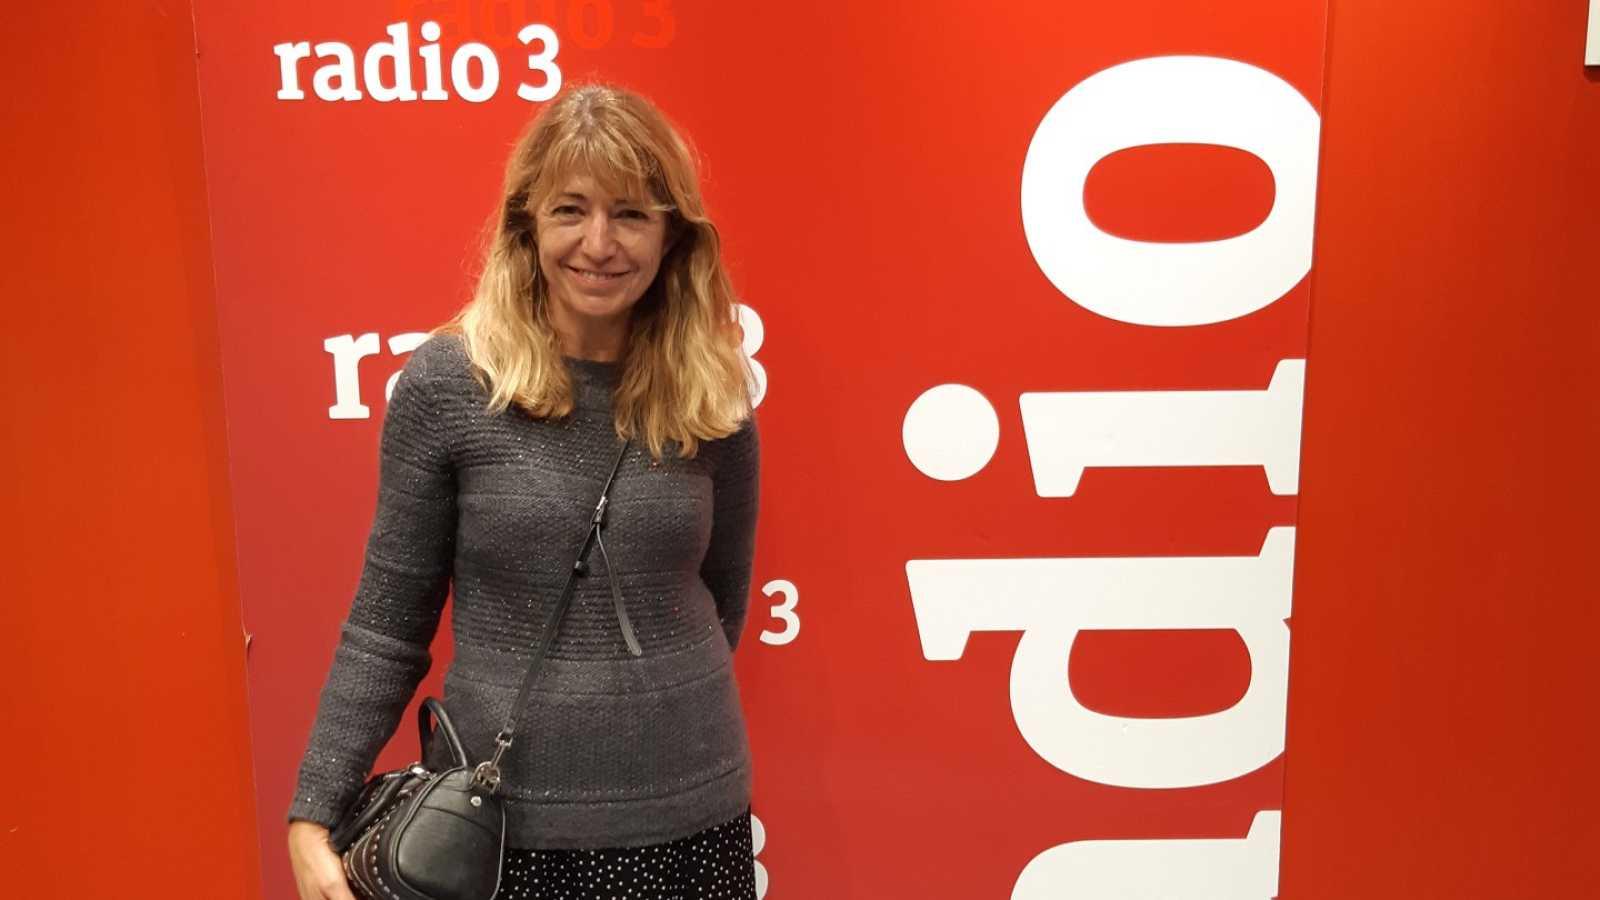 En Radio 3 - Inés París - 19/12/20 - escuchar ahora